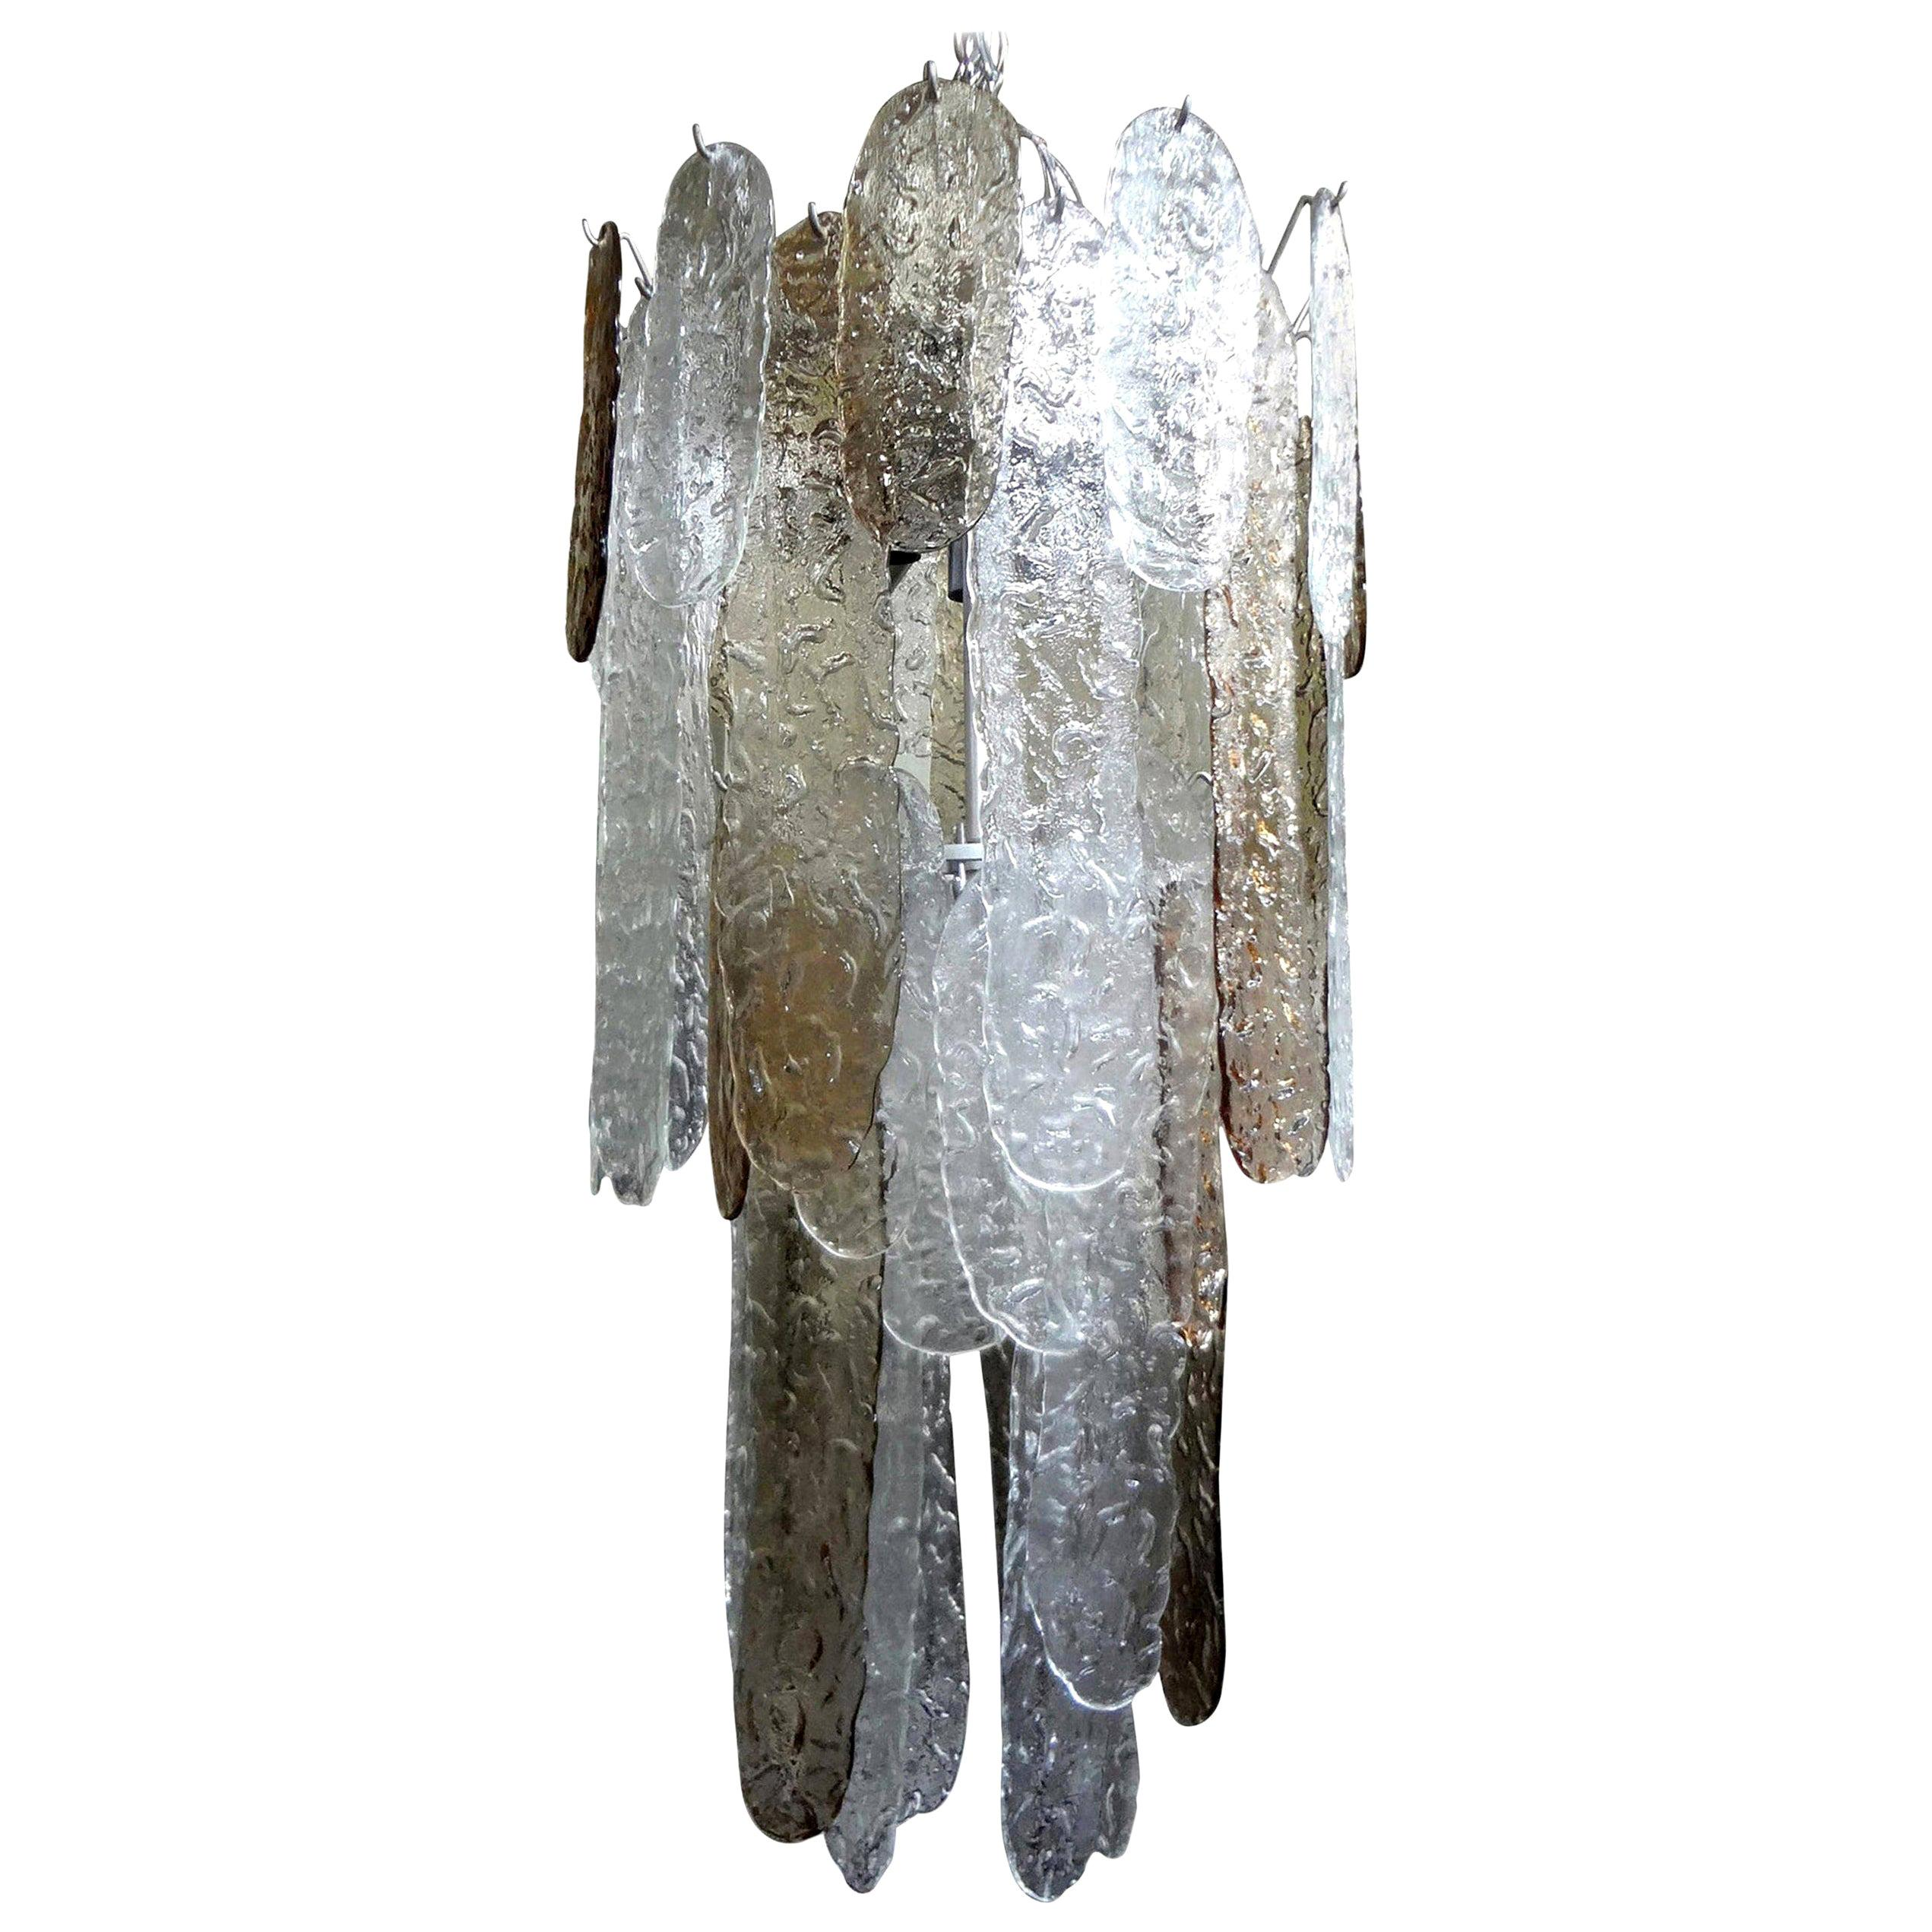 Murano Glass Waterfall Chandelier by Carlo Nason for Mazzega